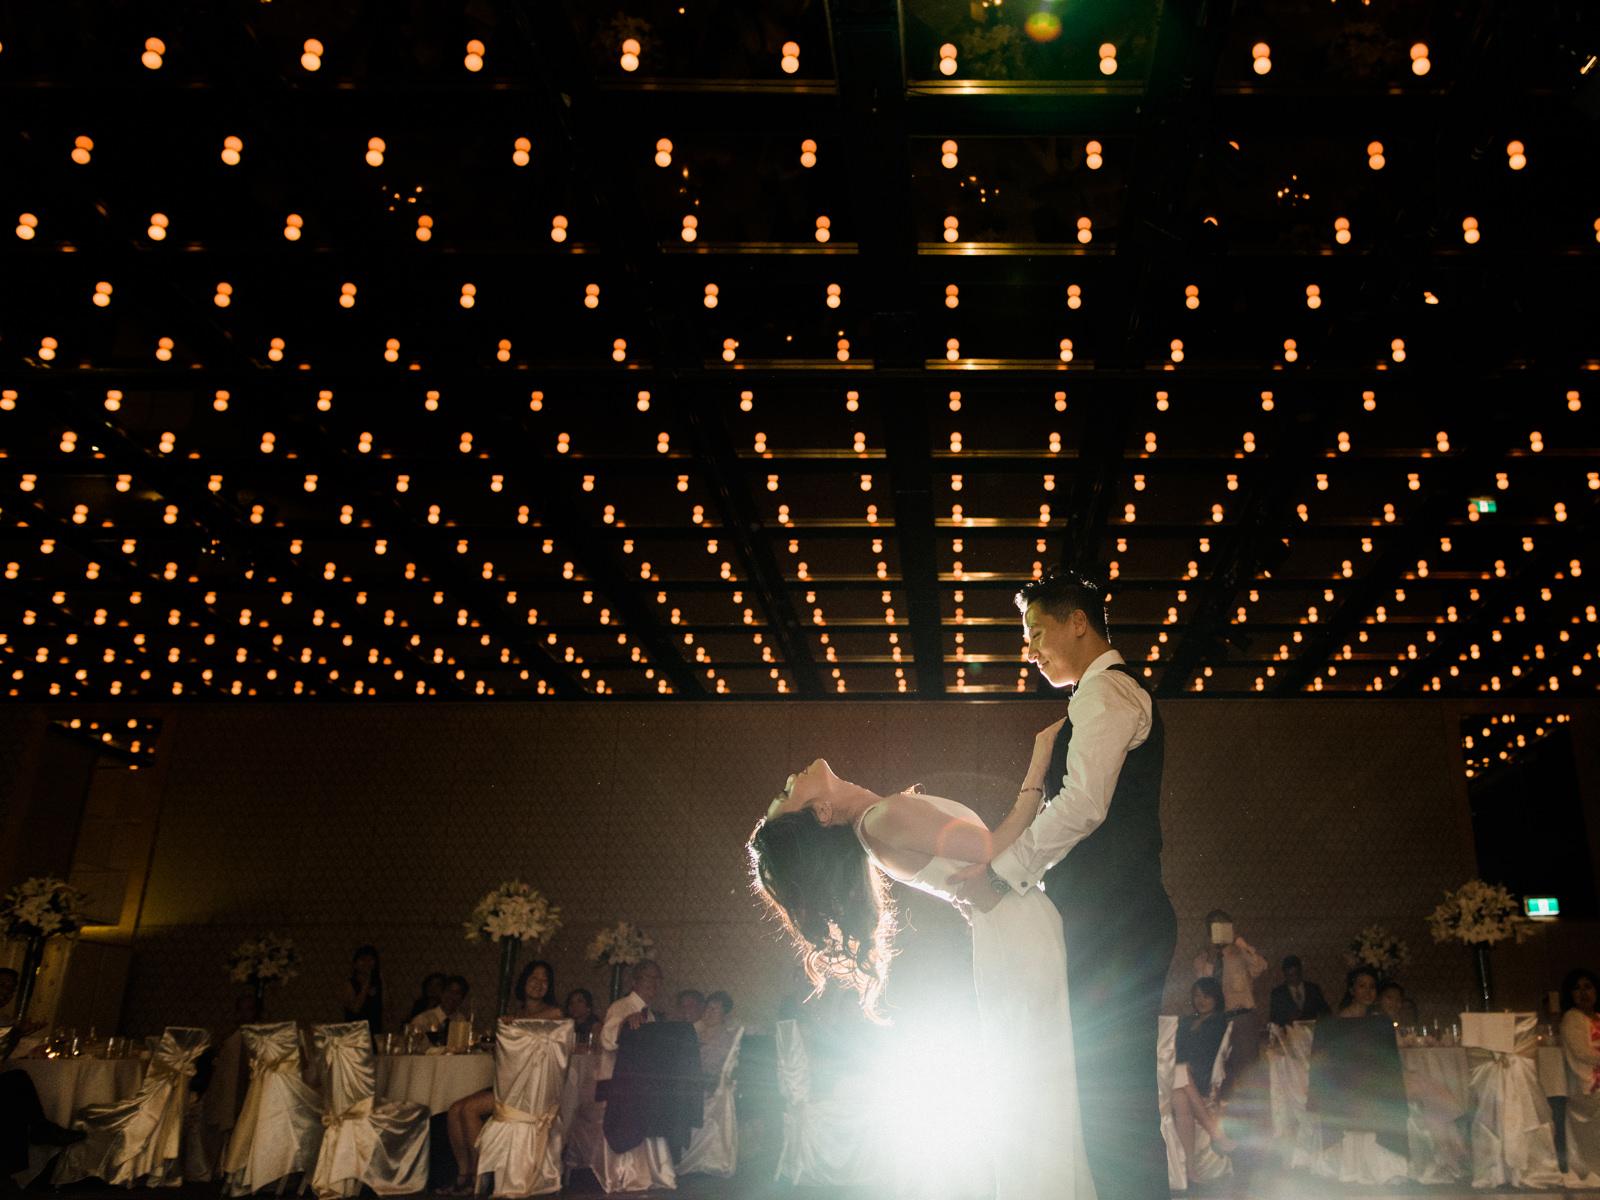 waop_jennifer&david_wedding-1014.jpg